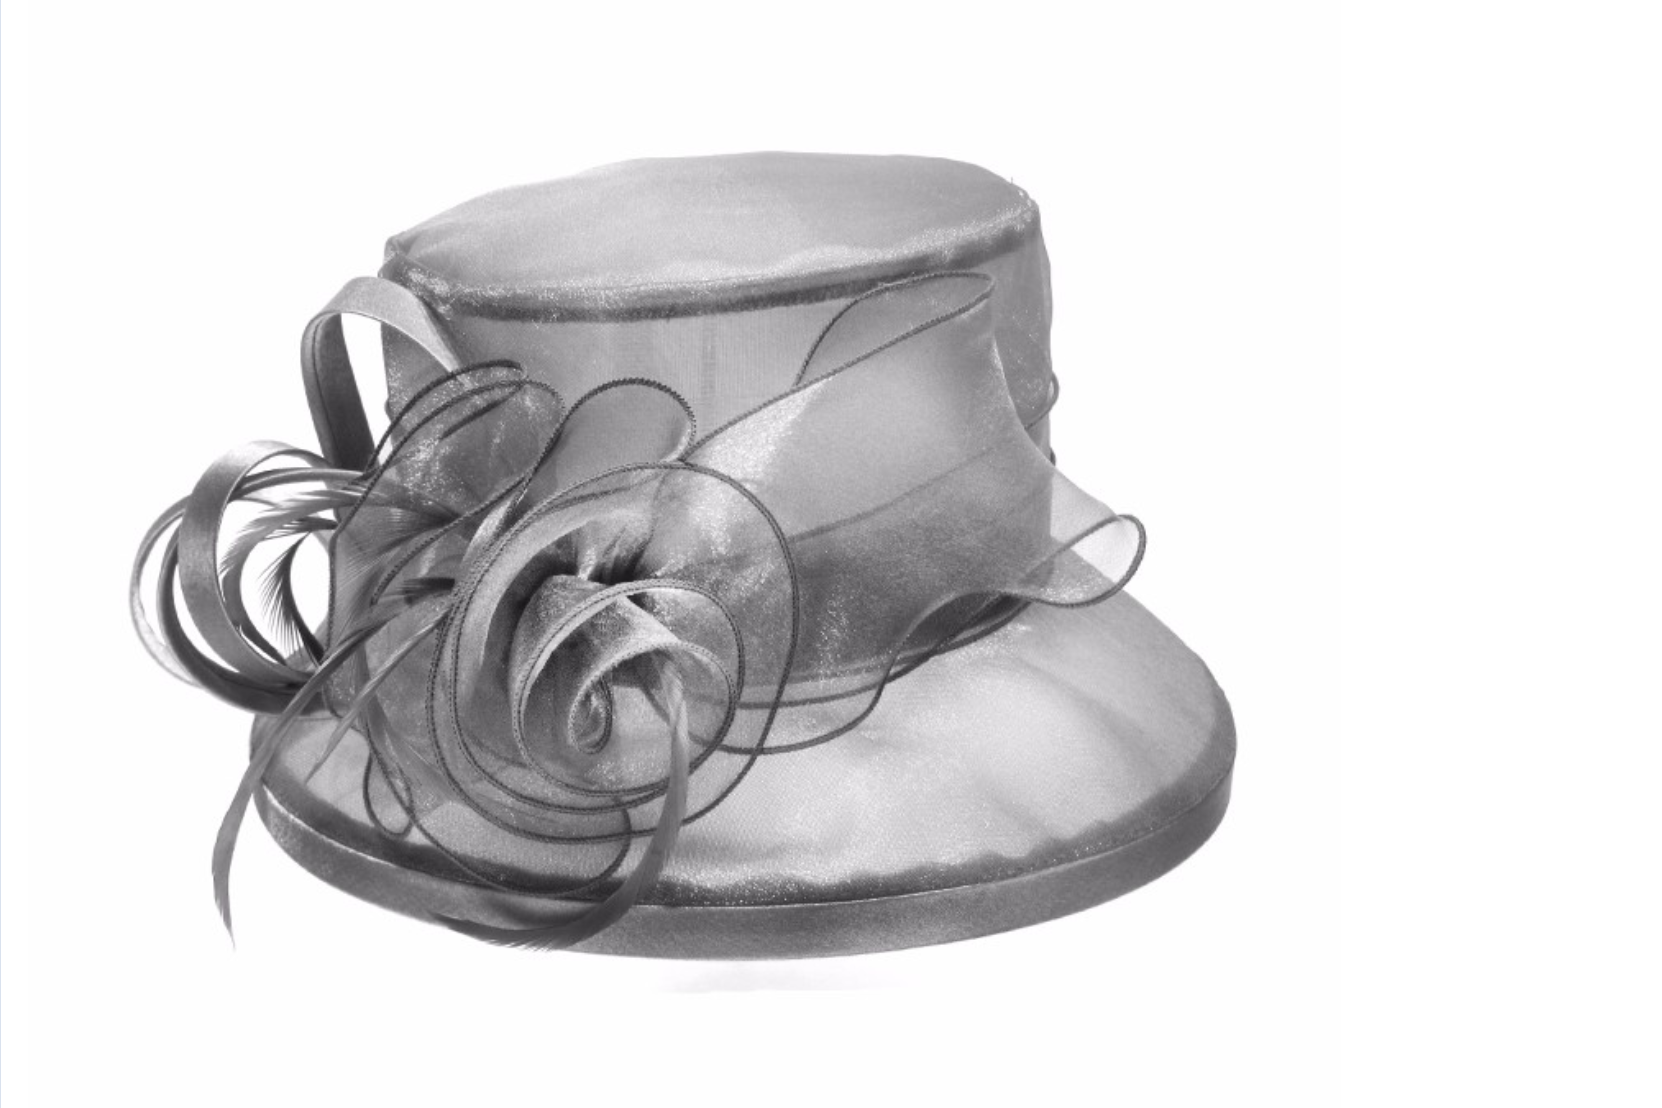 Customized Lady Gauze Church Hat Floral Vine Dress Hat Derby Wedding Party Hat for sale